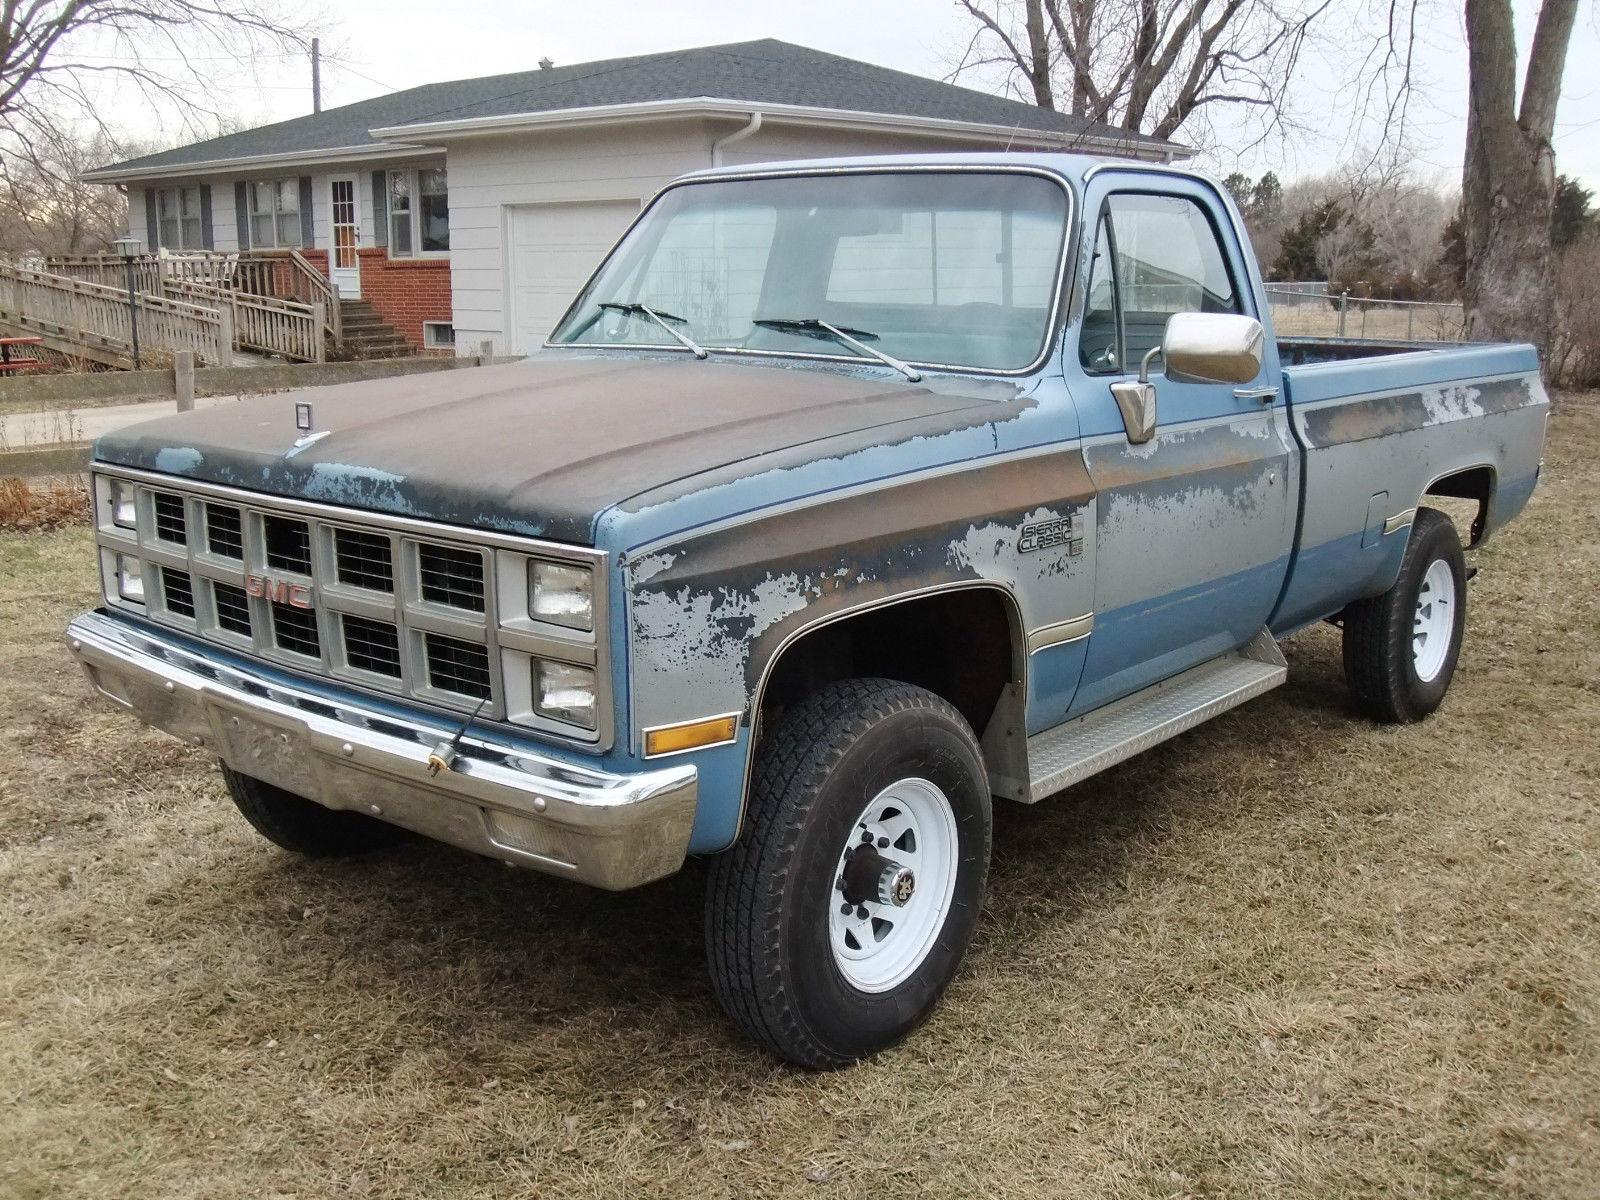 1982 gmc k2500 4x4 6 2l diesel oem paint 99 rustfree chevrolet c k pickup 2500 for sale in york. Black Bedroom Furniture Sets. Home Design Ideas